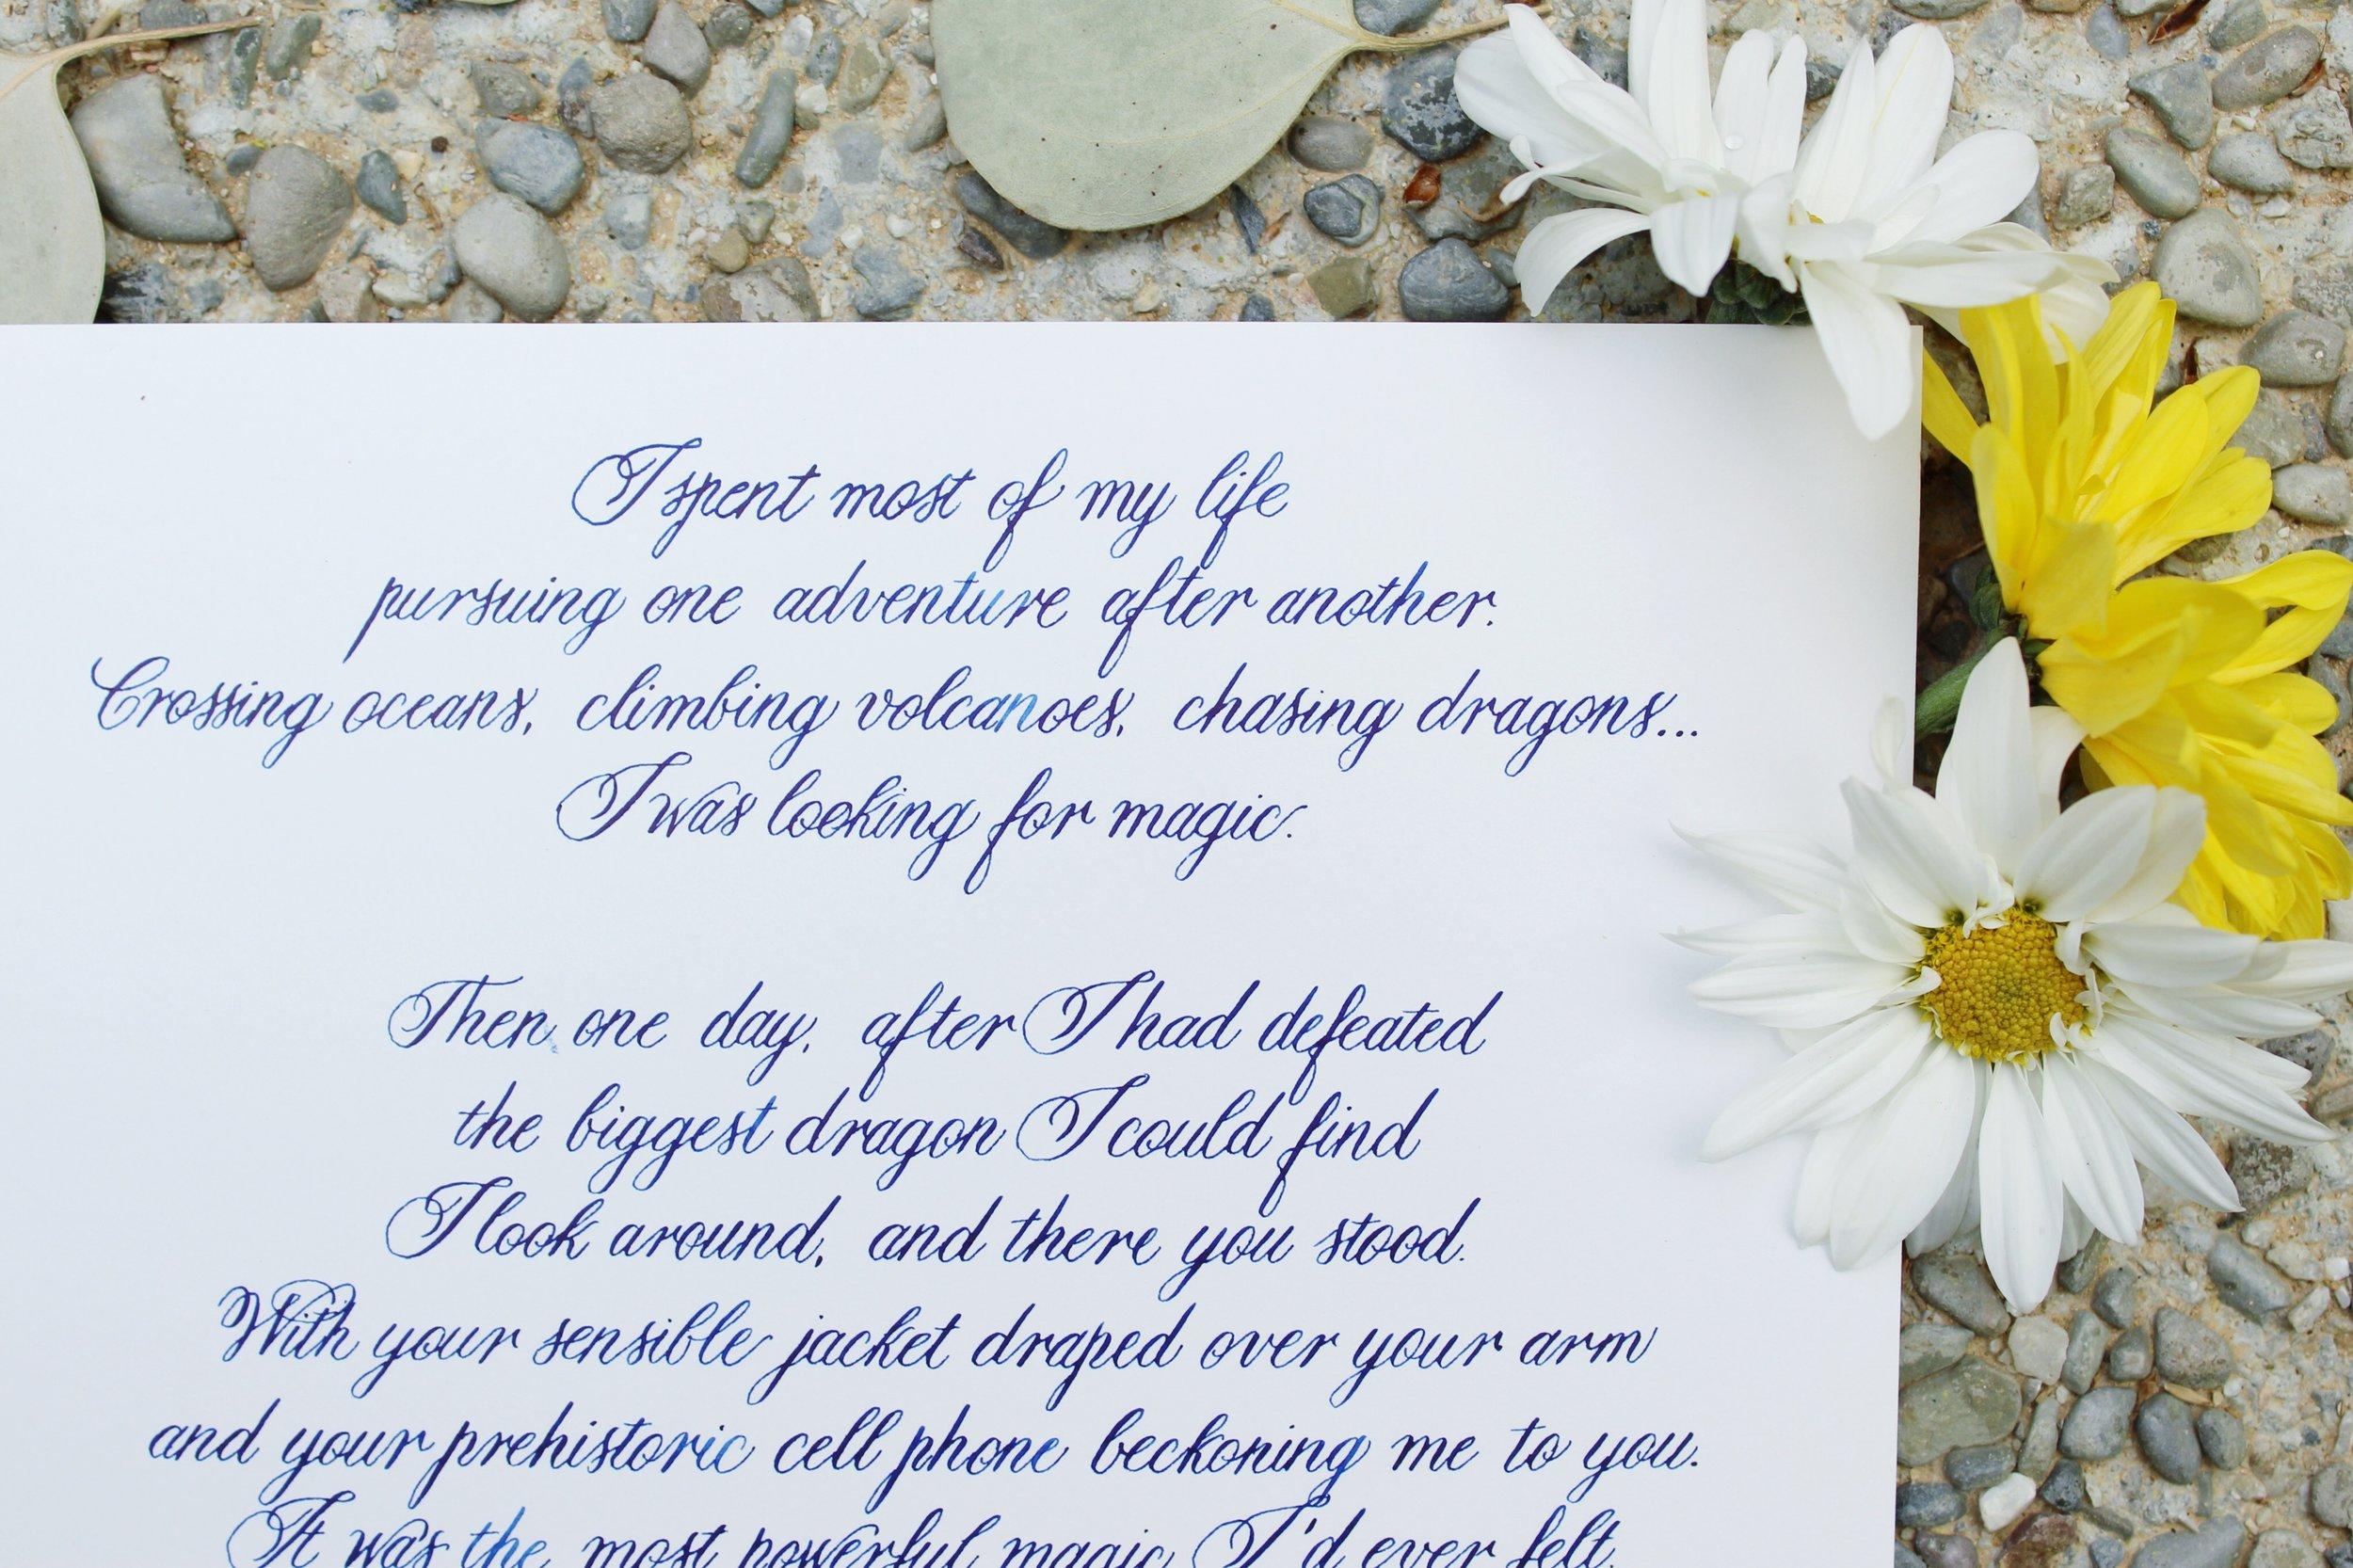 Central PA, York PA, JesSmith Designs, custom, wedding, invitations, bridal, announcements, save the date, baby, hanover, calligraphy, baltimore, wedding invitations, lancaster, gettysburg-05-11 05.01.07.jpg